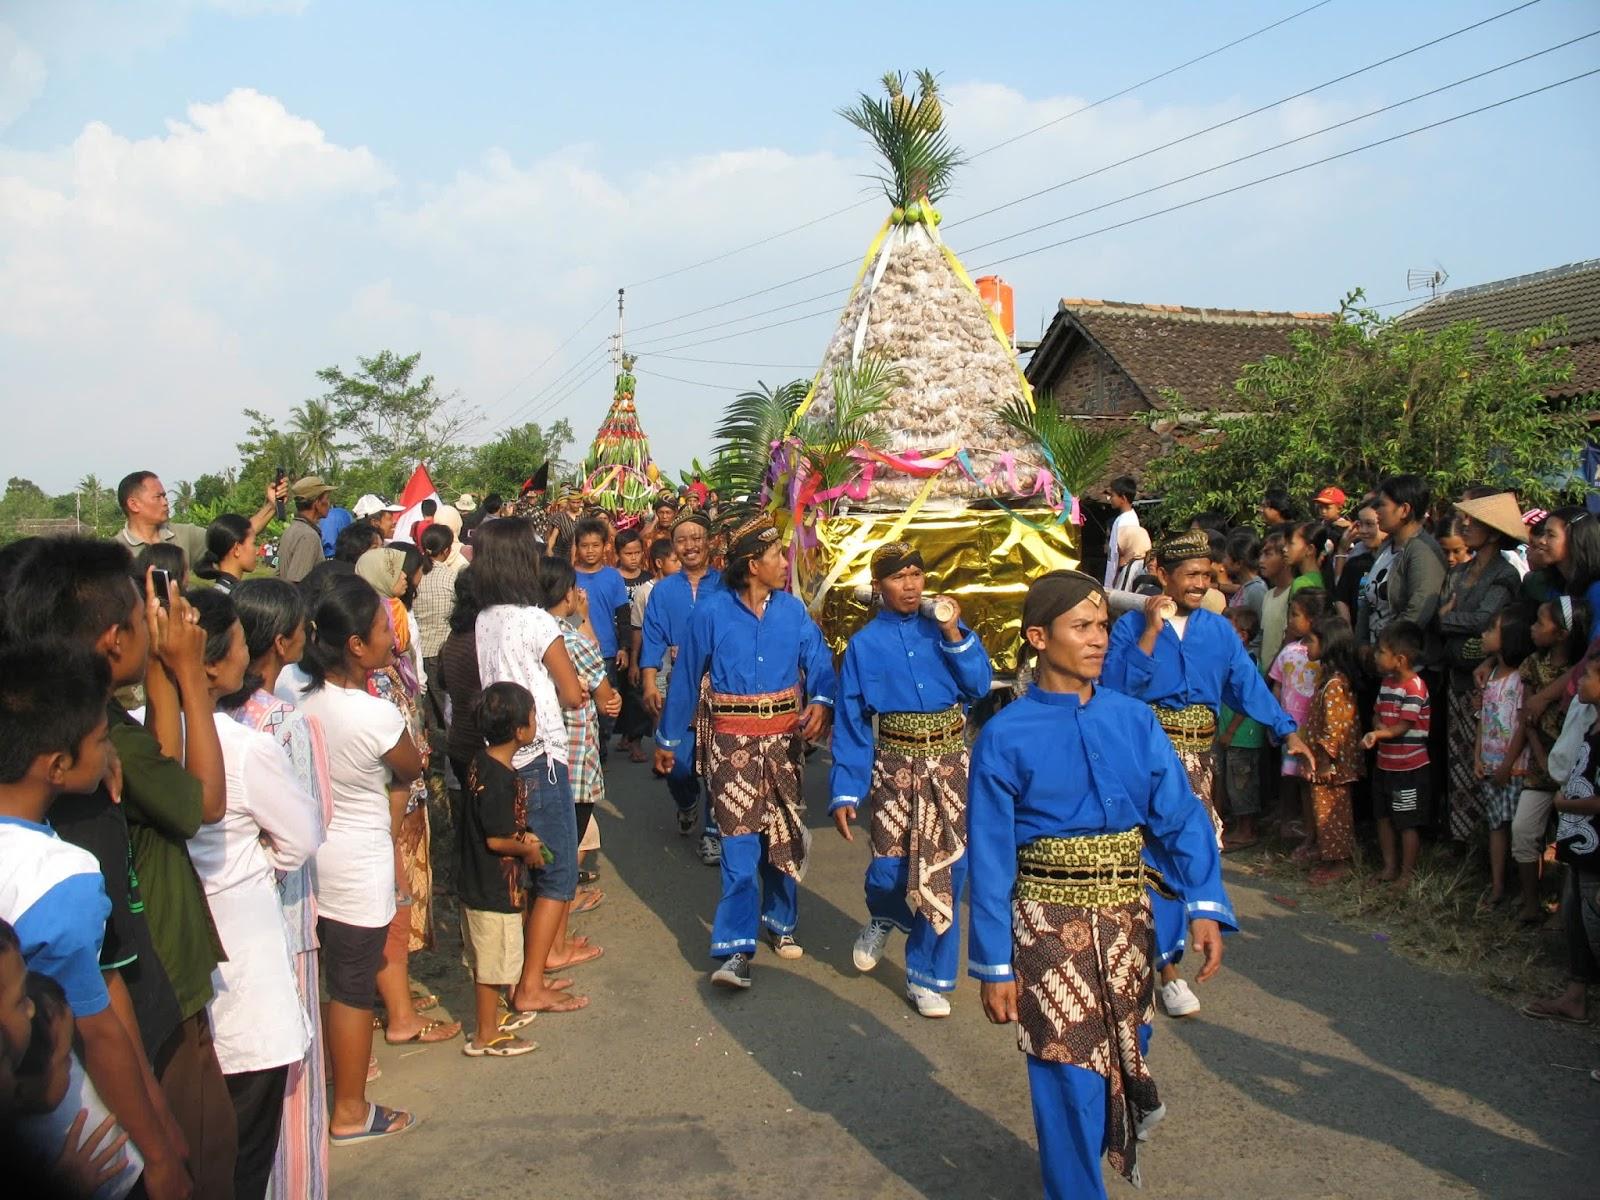 nabella harun: Indonesian Culture is Almost Extinct